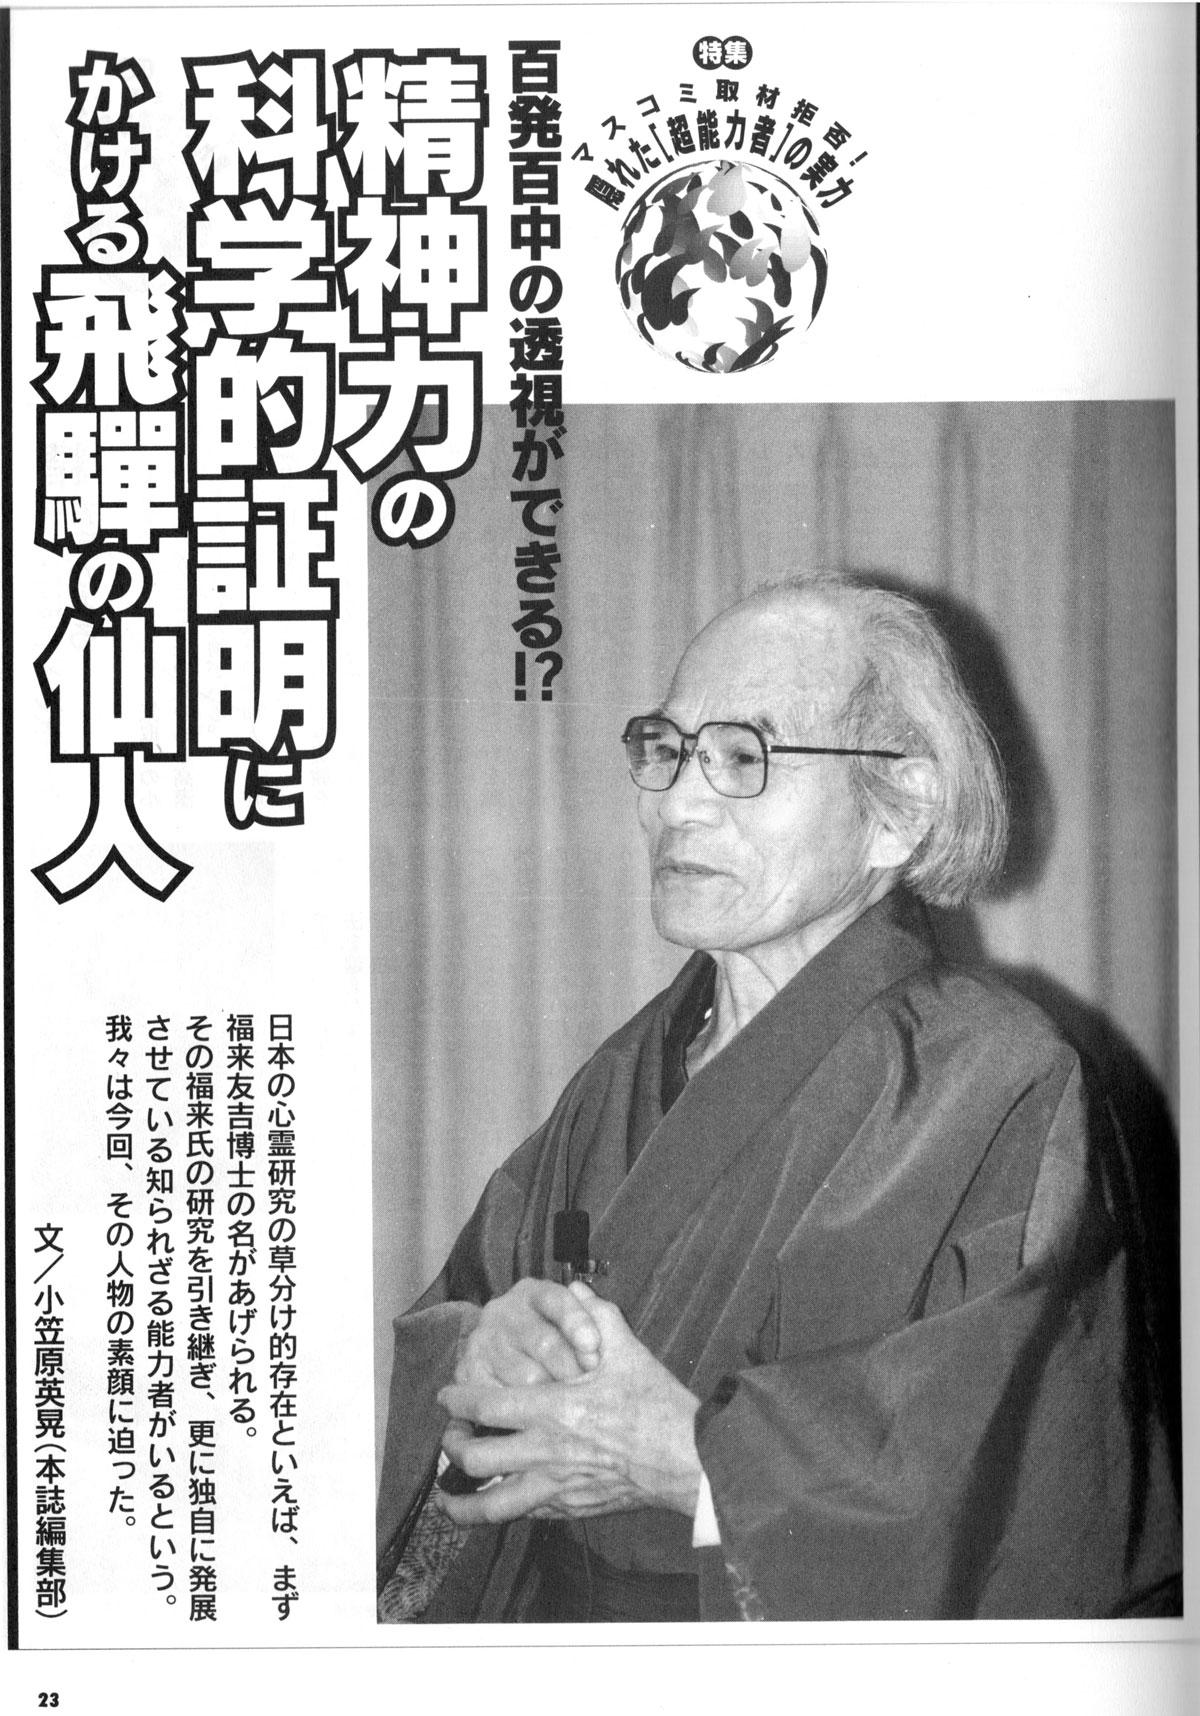 山本健造先生の六次元論1